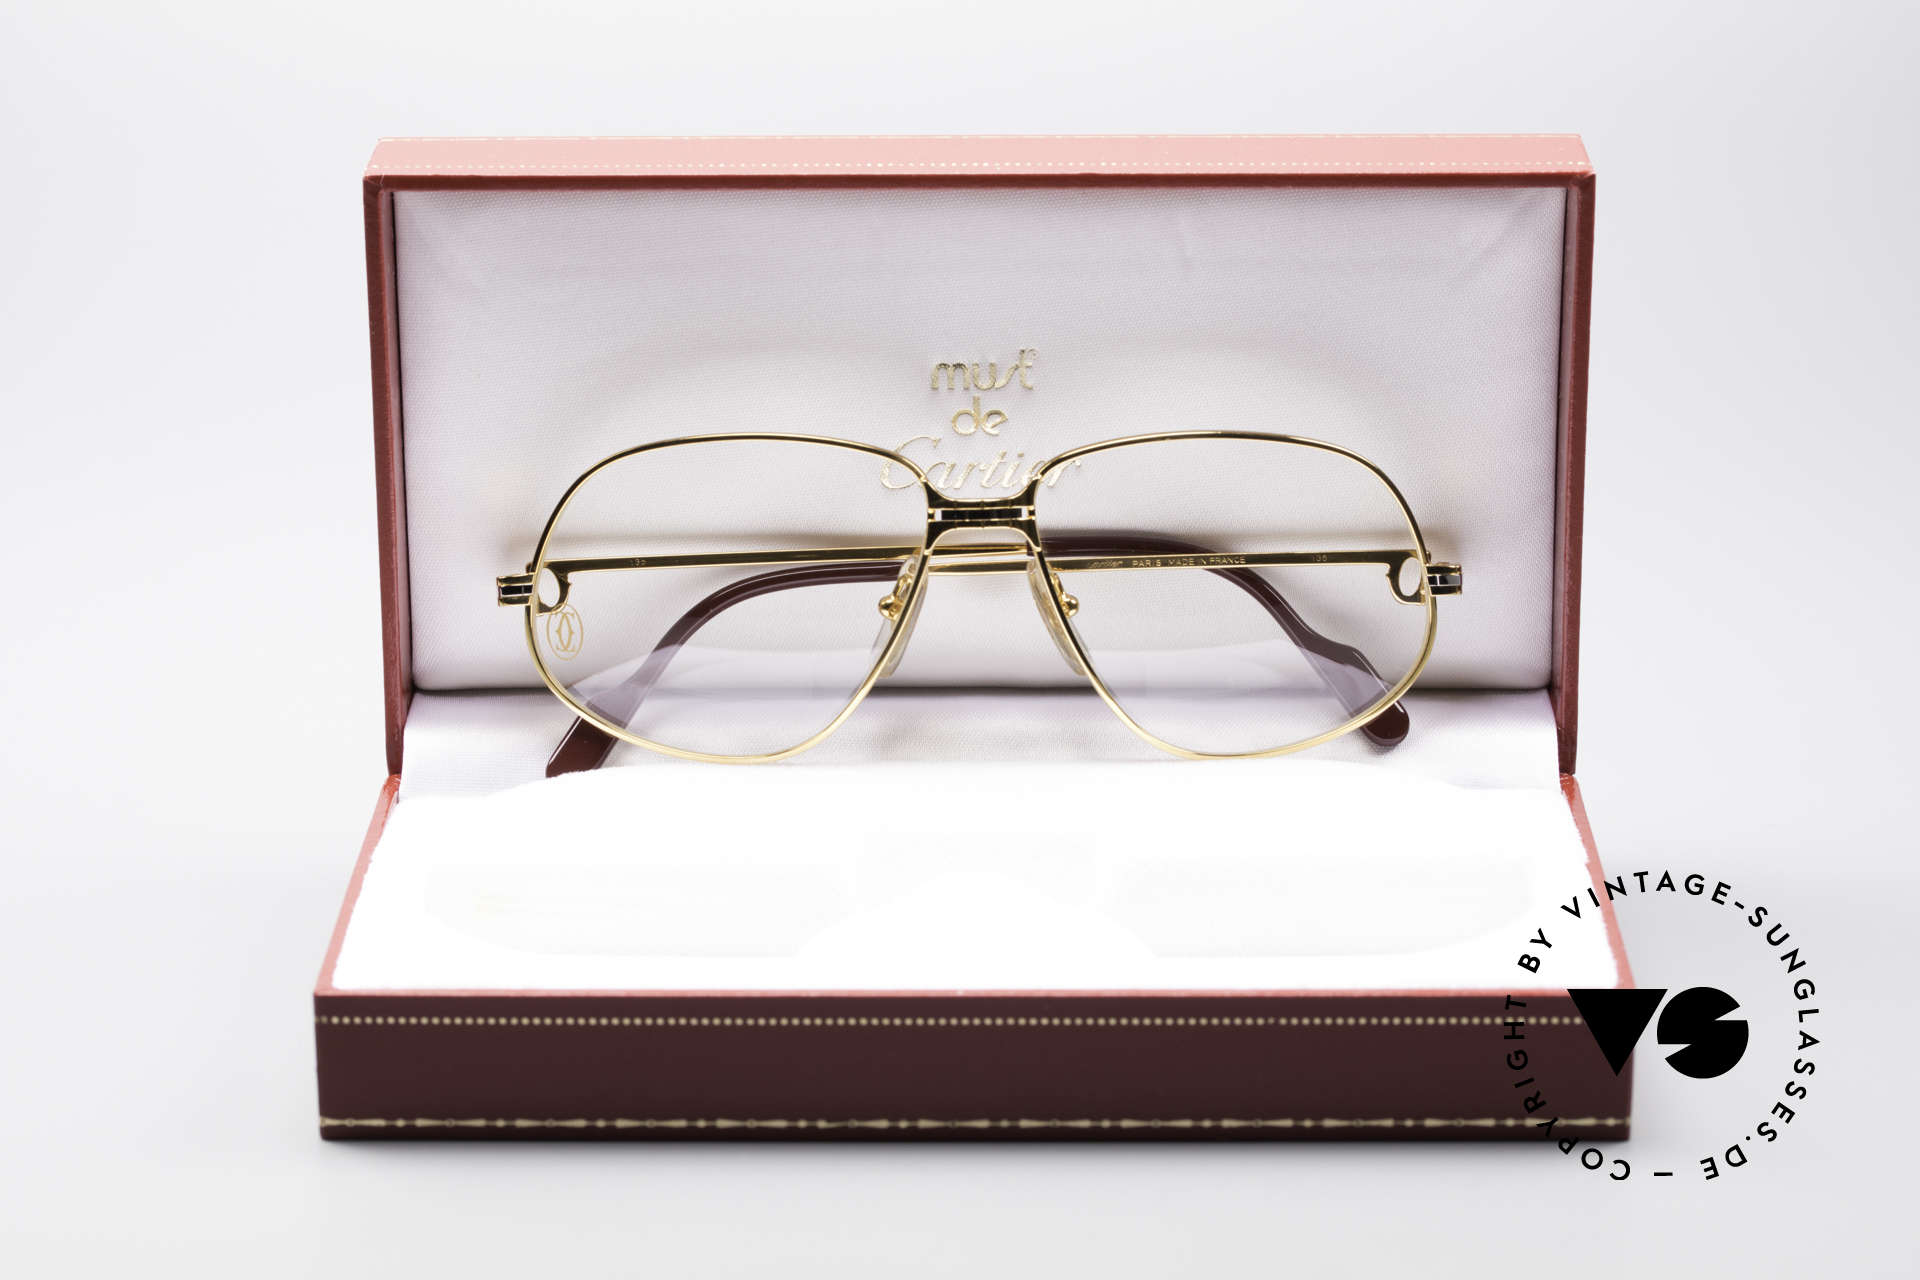 Cartier Panthere G.M. - M Luxury Eyeglasses, UNWORN 30 years old vintage ORIGINAL! (NO RETRO!), Made for Men